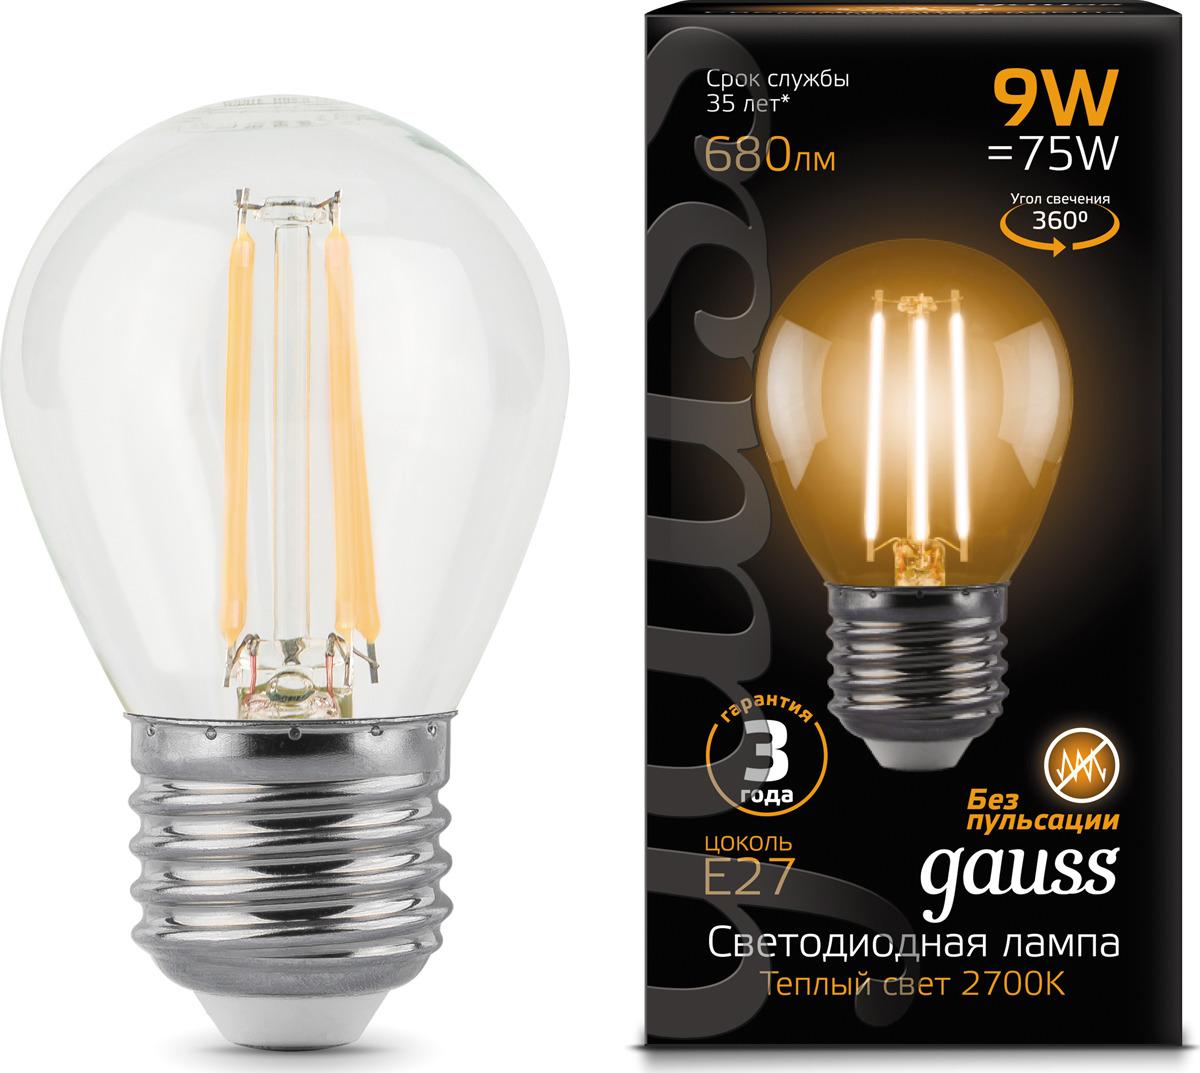 Лампочка Gauss Black Filament LED, шар, E27, 9W. 105802109 gauss лампа светодиодная gauss filament globe шар прозрачный e27 9w 2700k 105802109